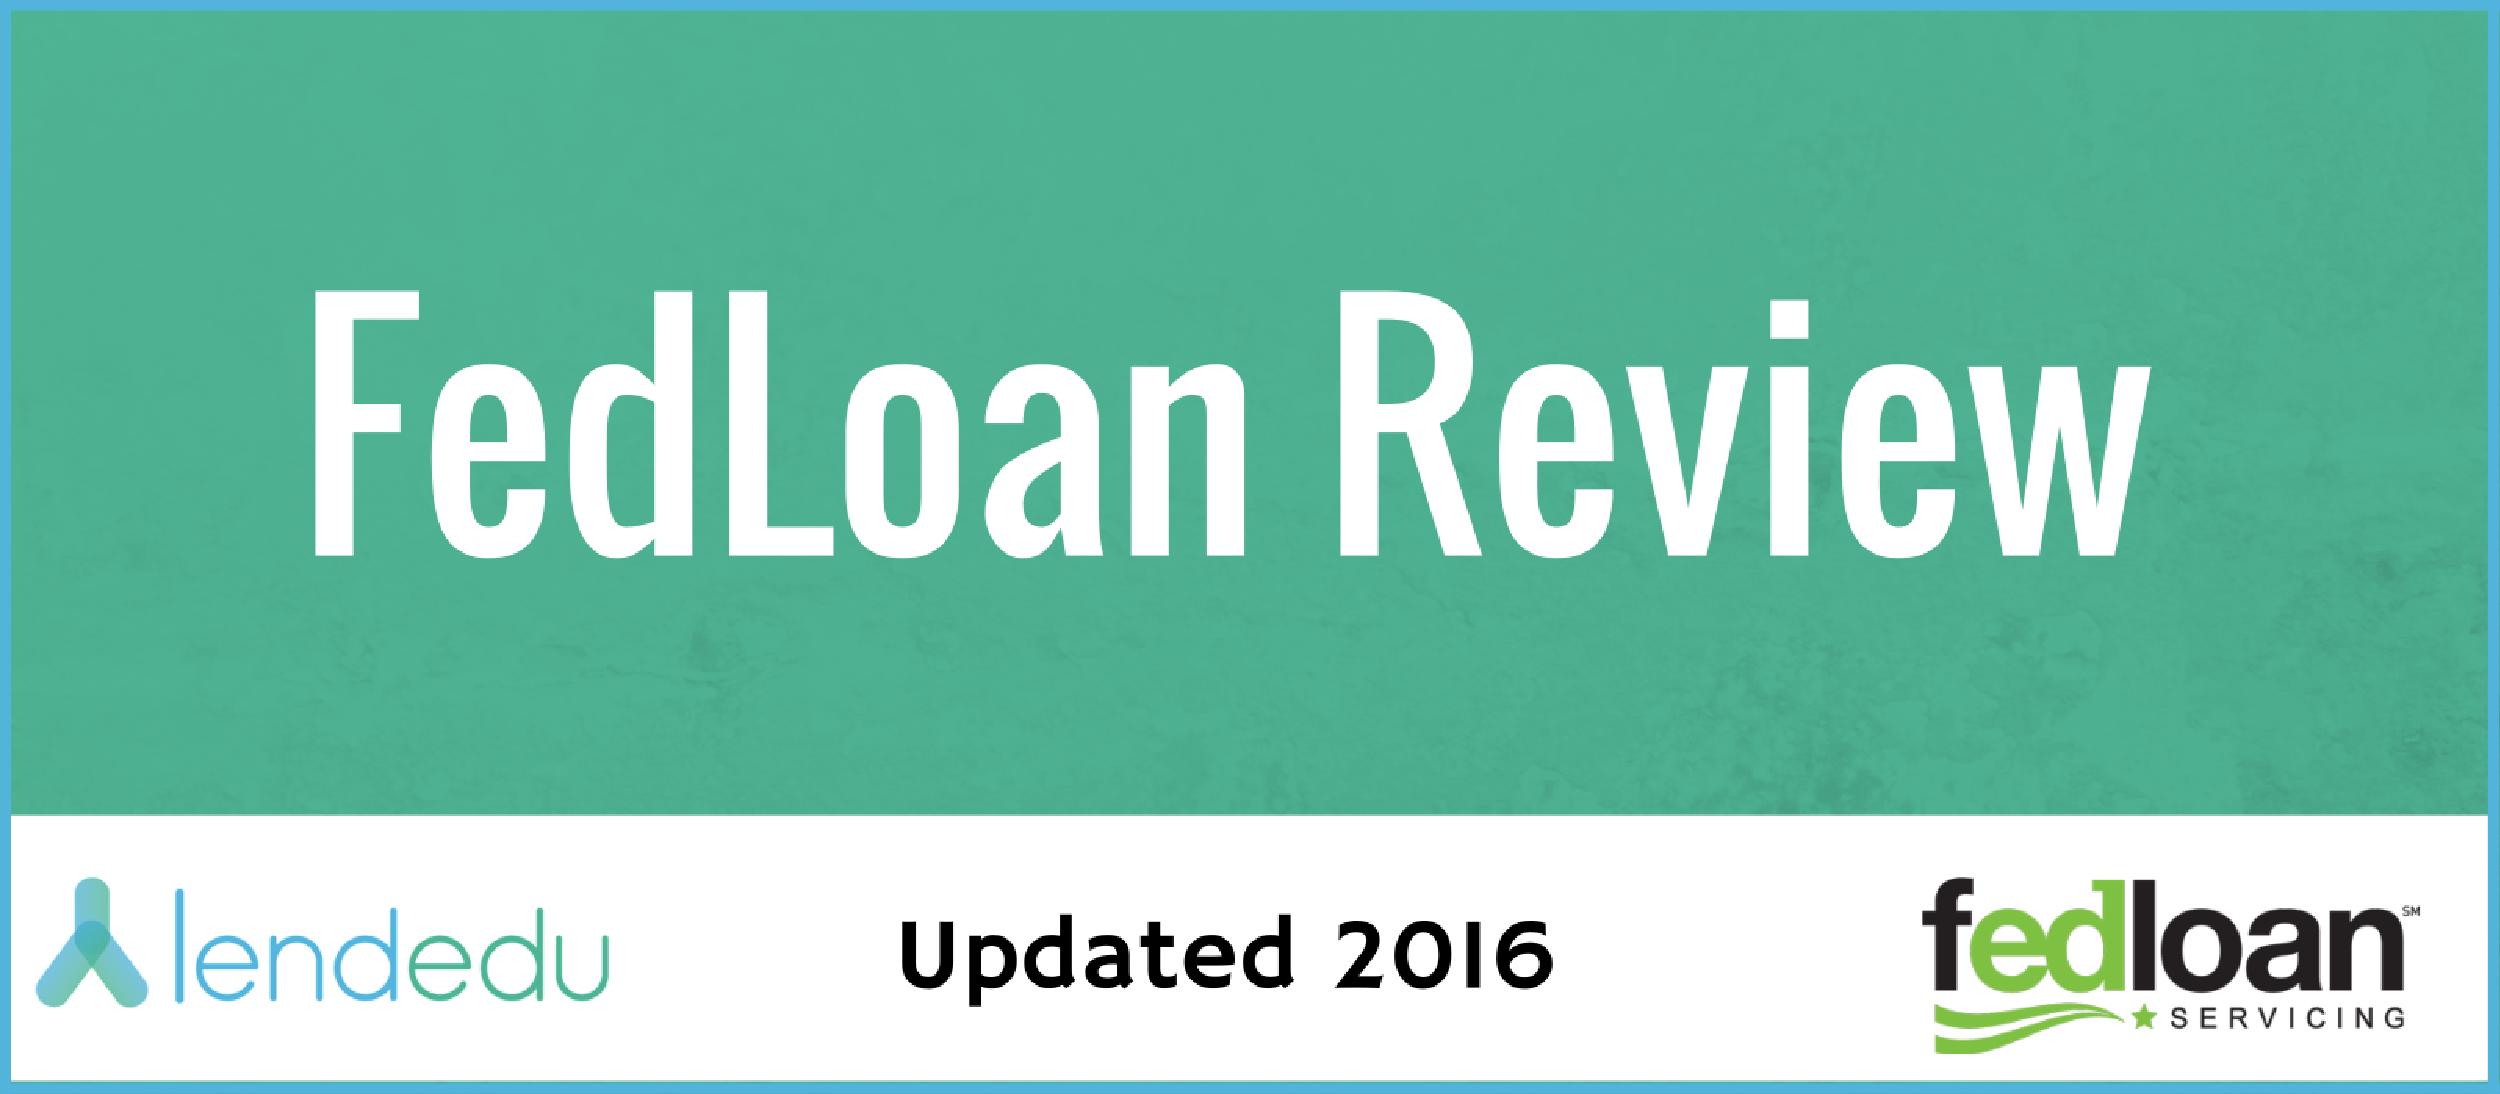 blog loans student fedloan servicing